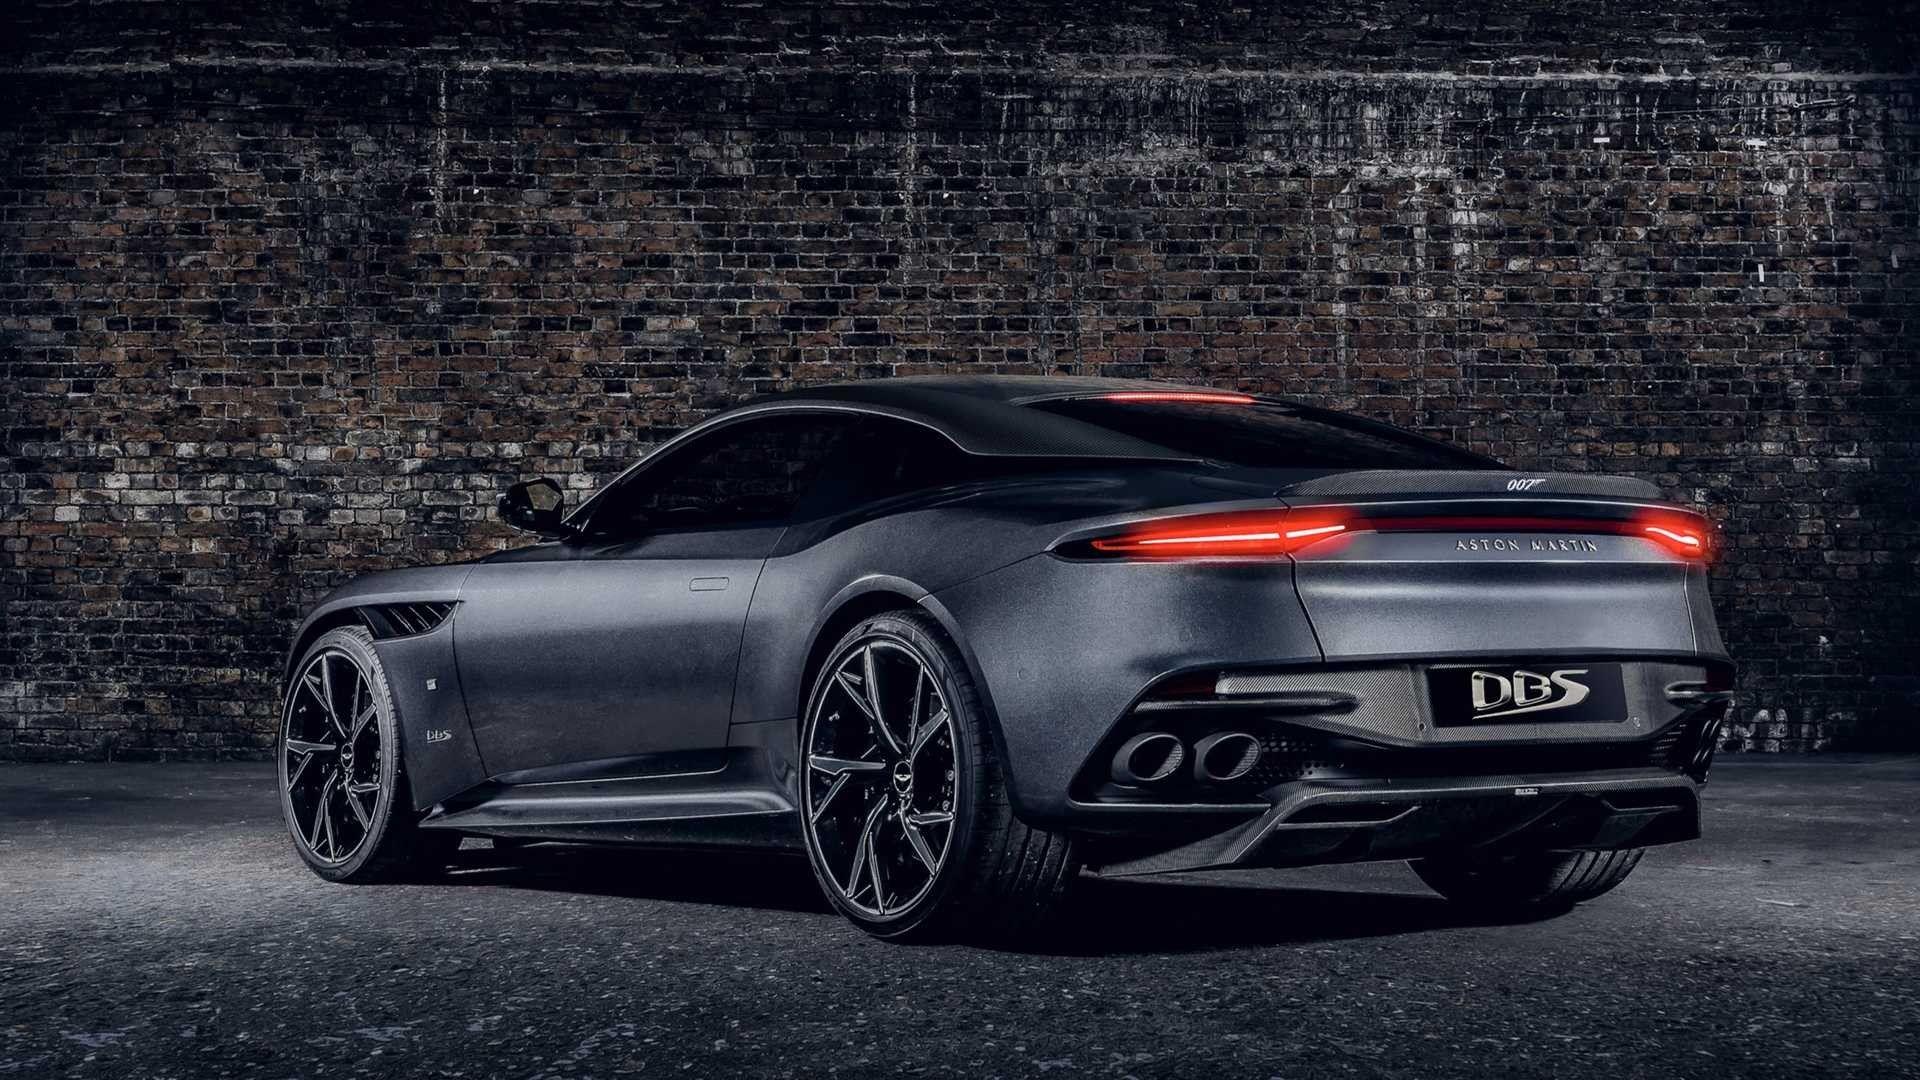 Aston Martin Dbs Superleggera 007 Edition Q By Aston Martin 2020 Sportwagen Sport